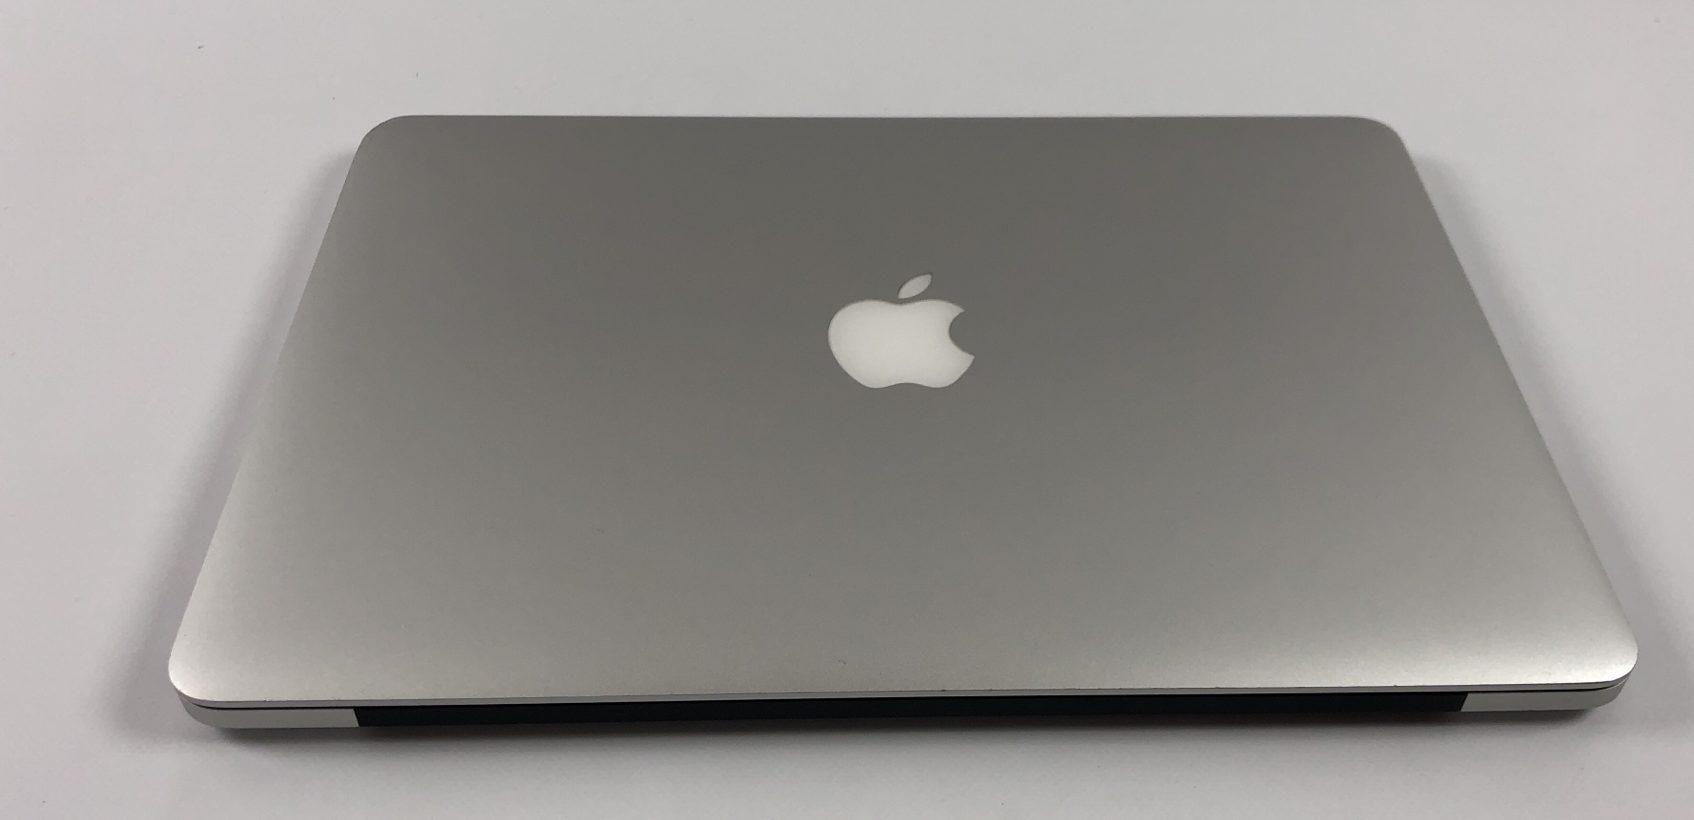 "MacBook Pro Retina 13"" Early 2015 (Intel Core i5 2.7 GHz 8 GB RAM 256 GB SSD), Intel Core i5 2.7 GHz, 8 GB RAM, 256 GB SSD, bild 2"